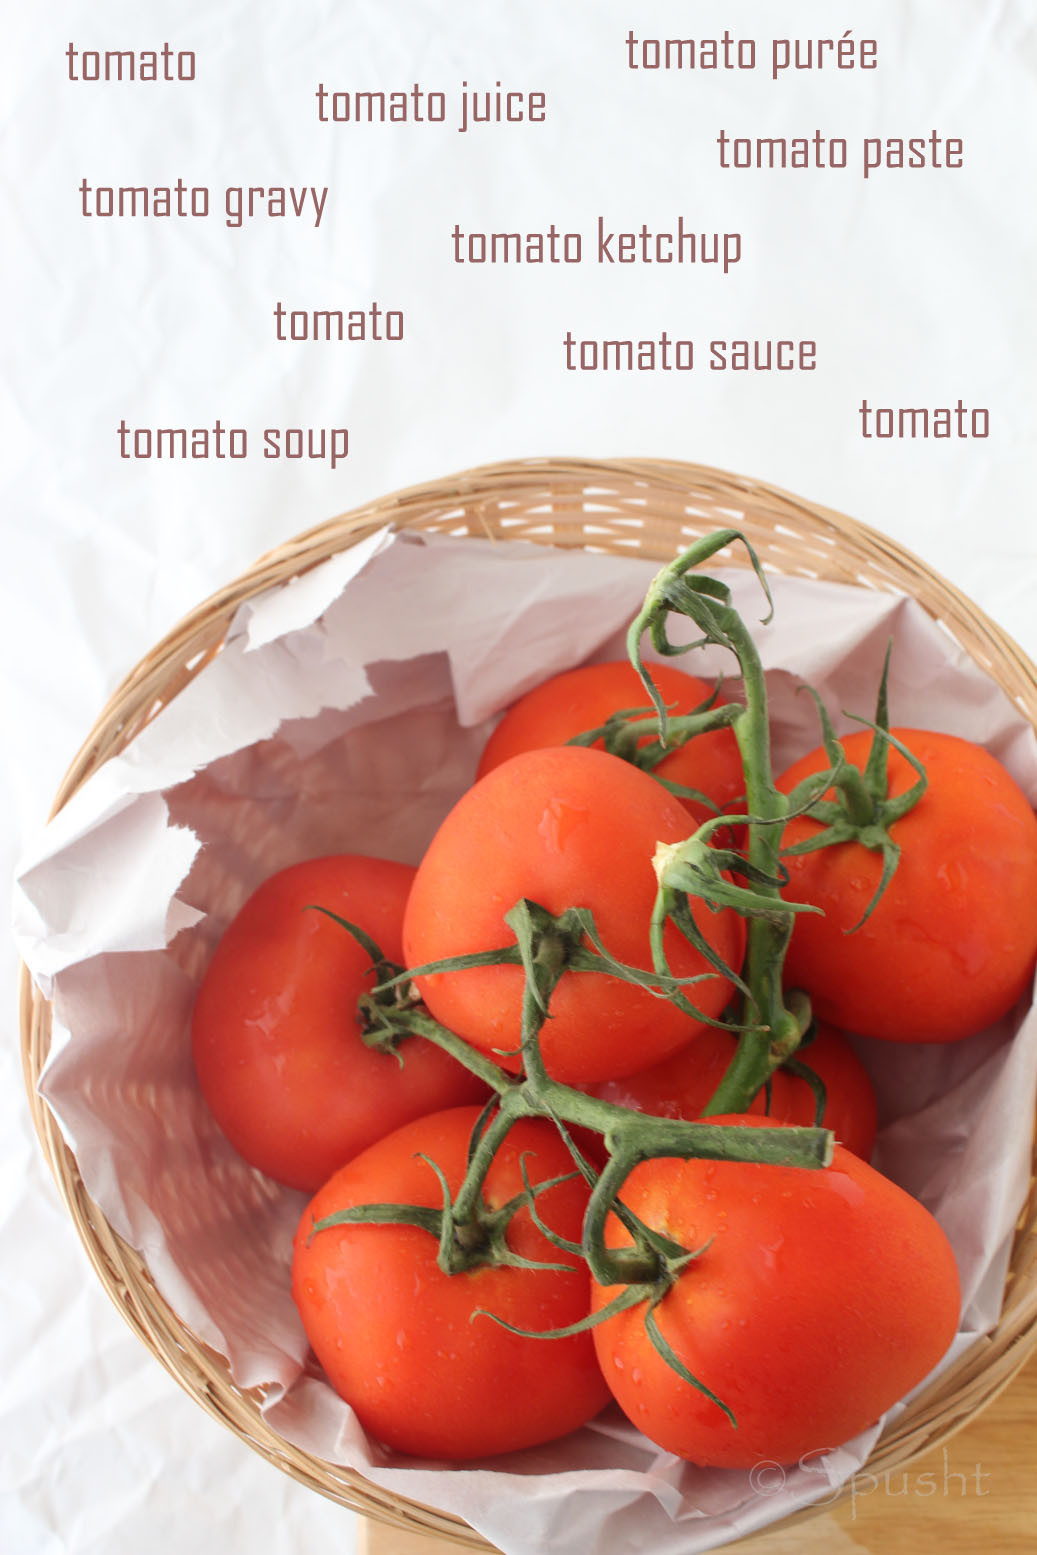 Tomato Soup From Tomato Paste  Spusht Tomato Paste Purée Juice Gravy Soup Sauce